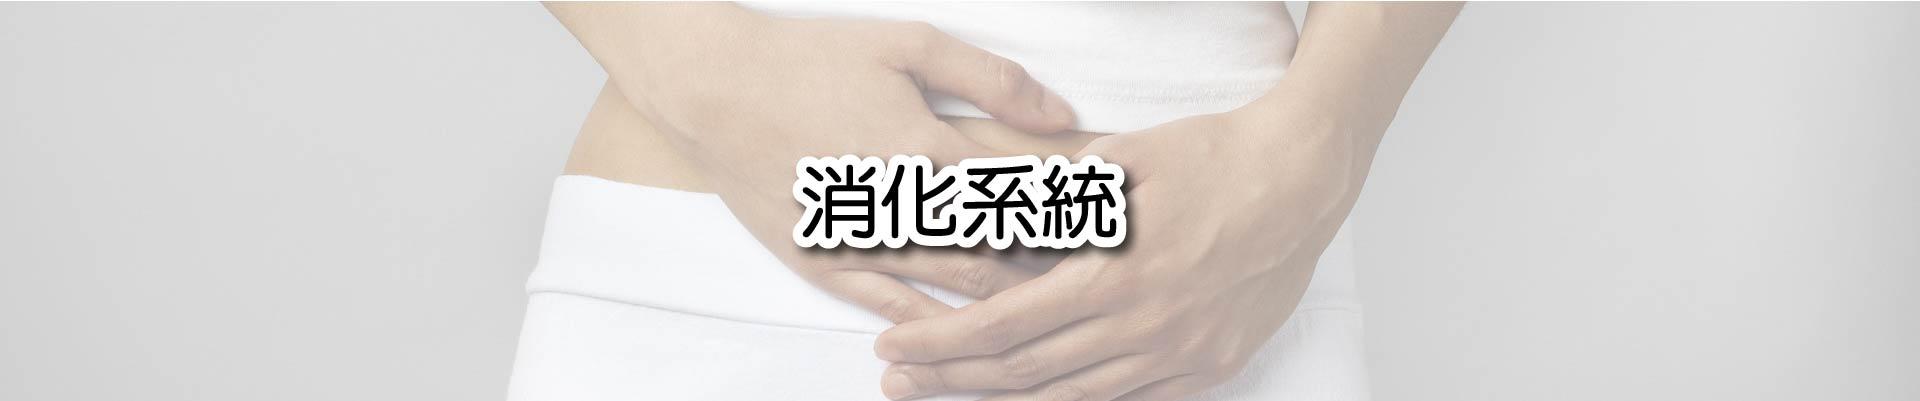 c-digestive-system-1-8.jpg